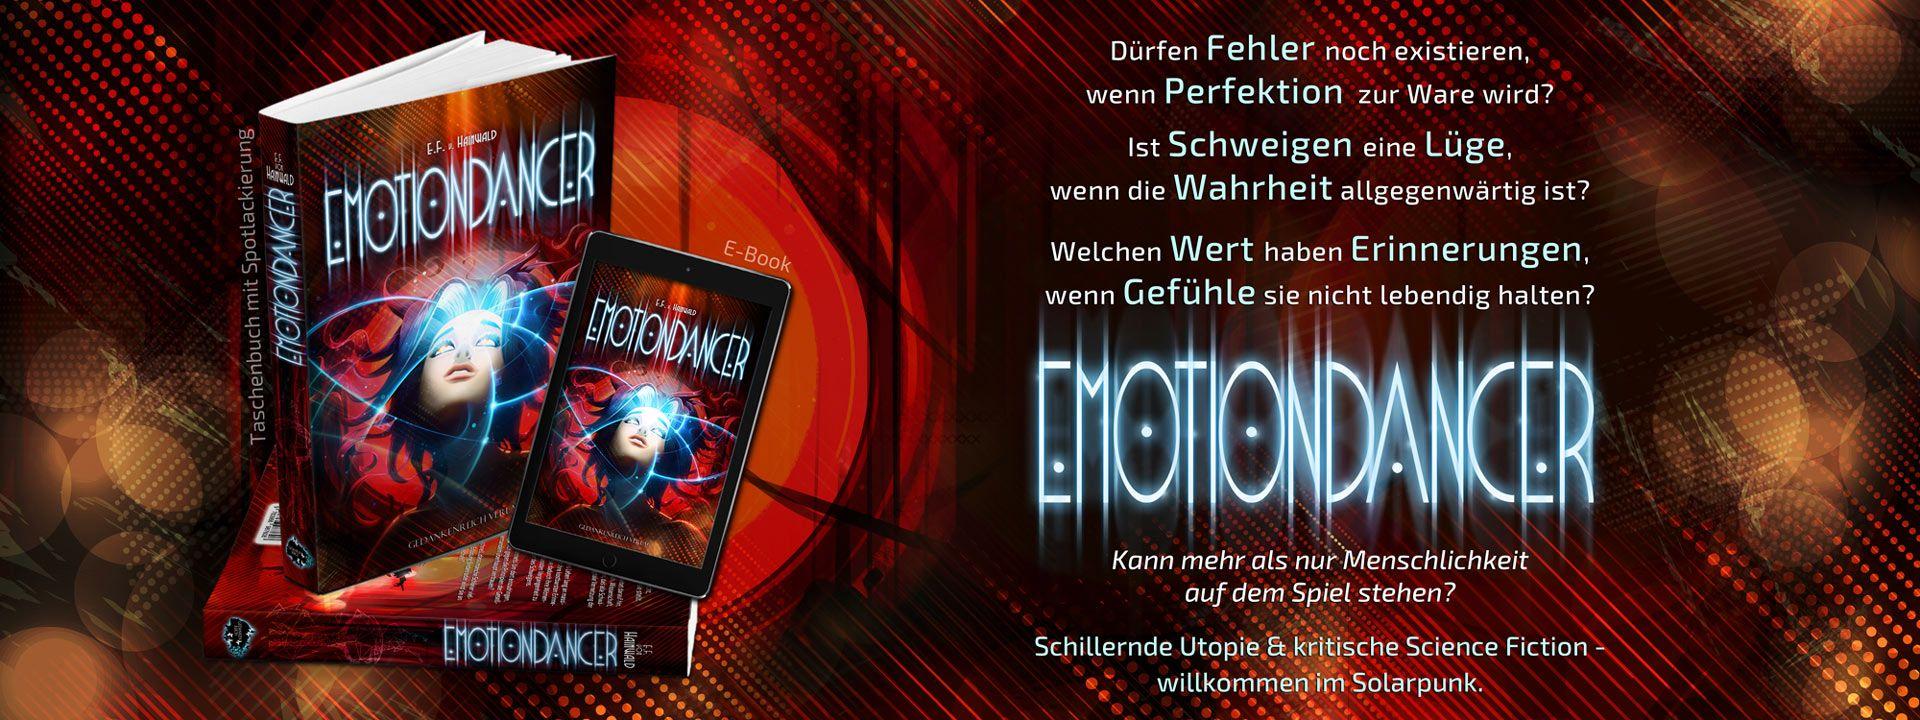 "alt=""Emotiondancer Buch"""